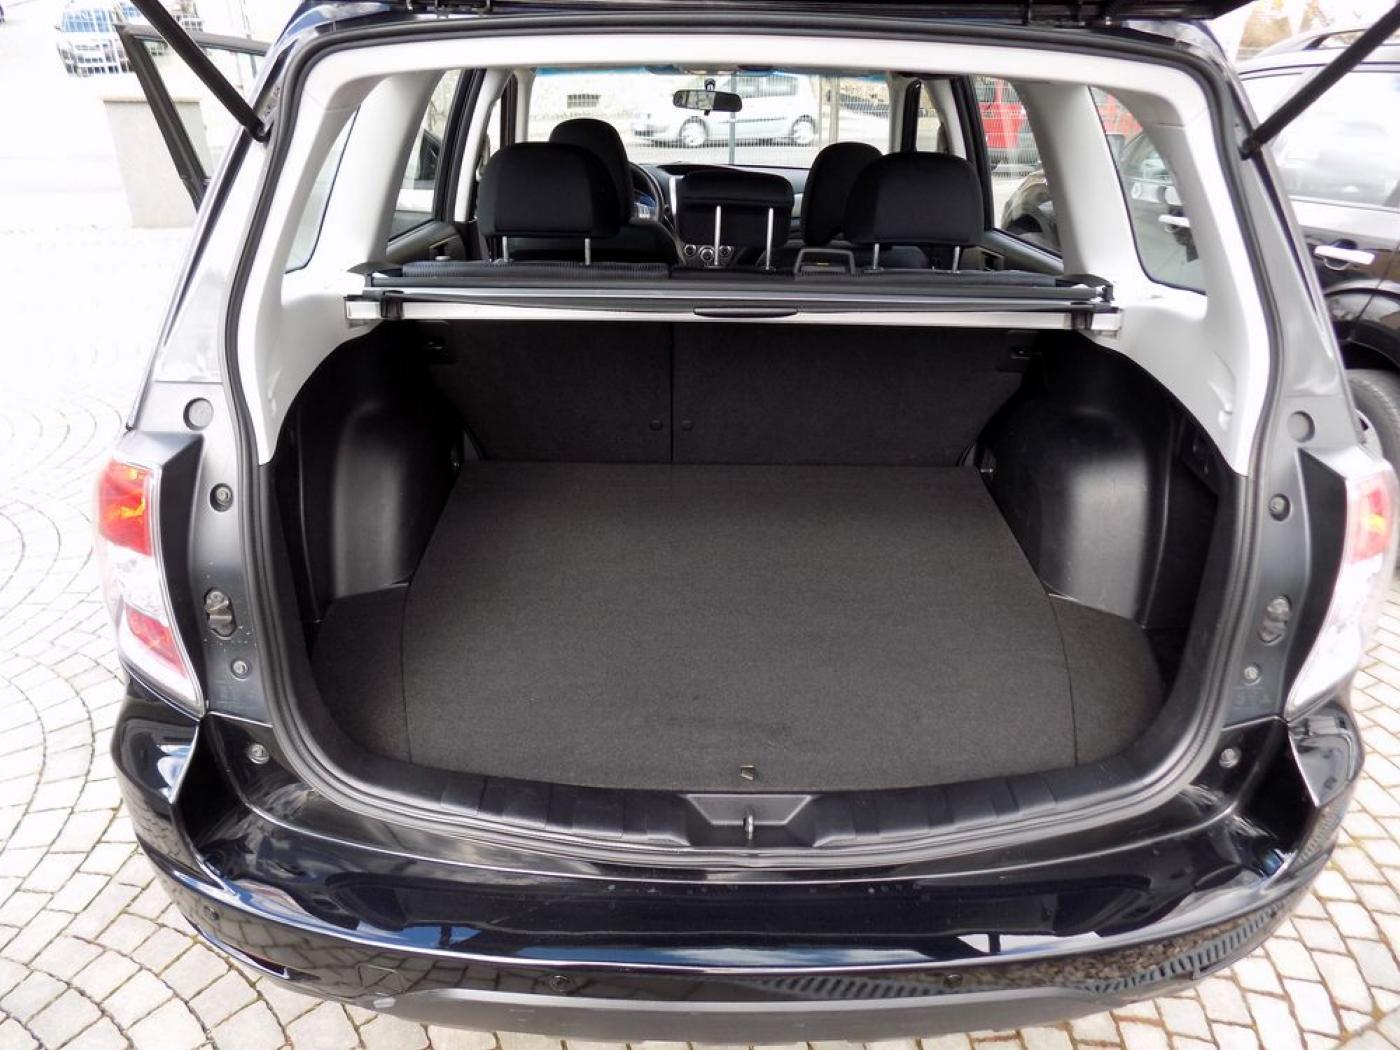 Subaru Forester 2.0 AWD Bi-Fuel LPG